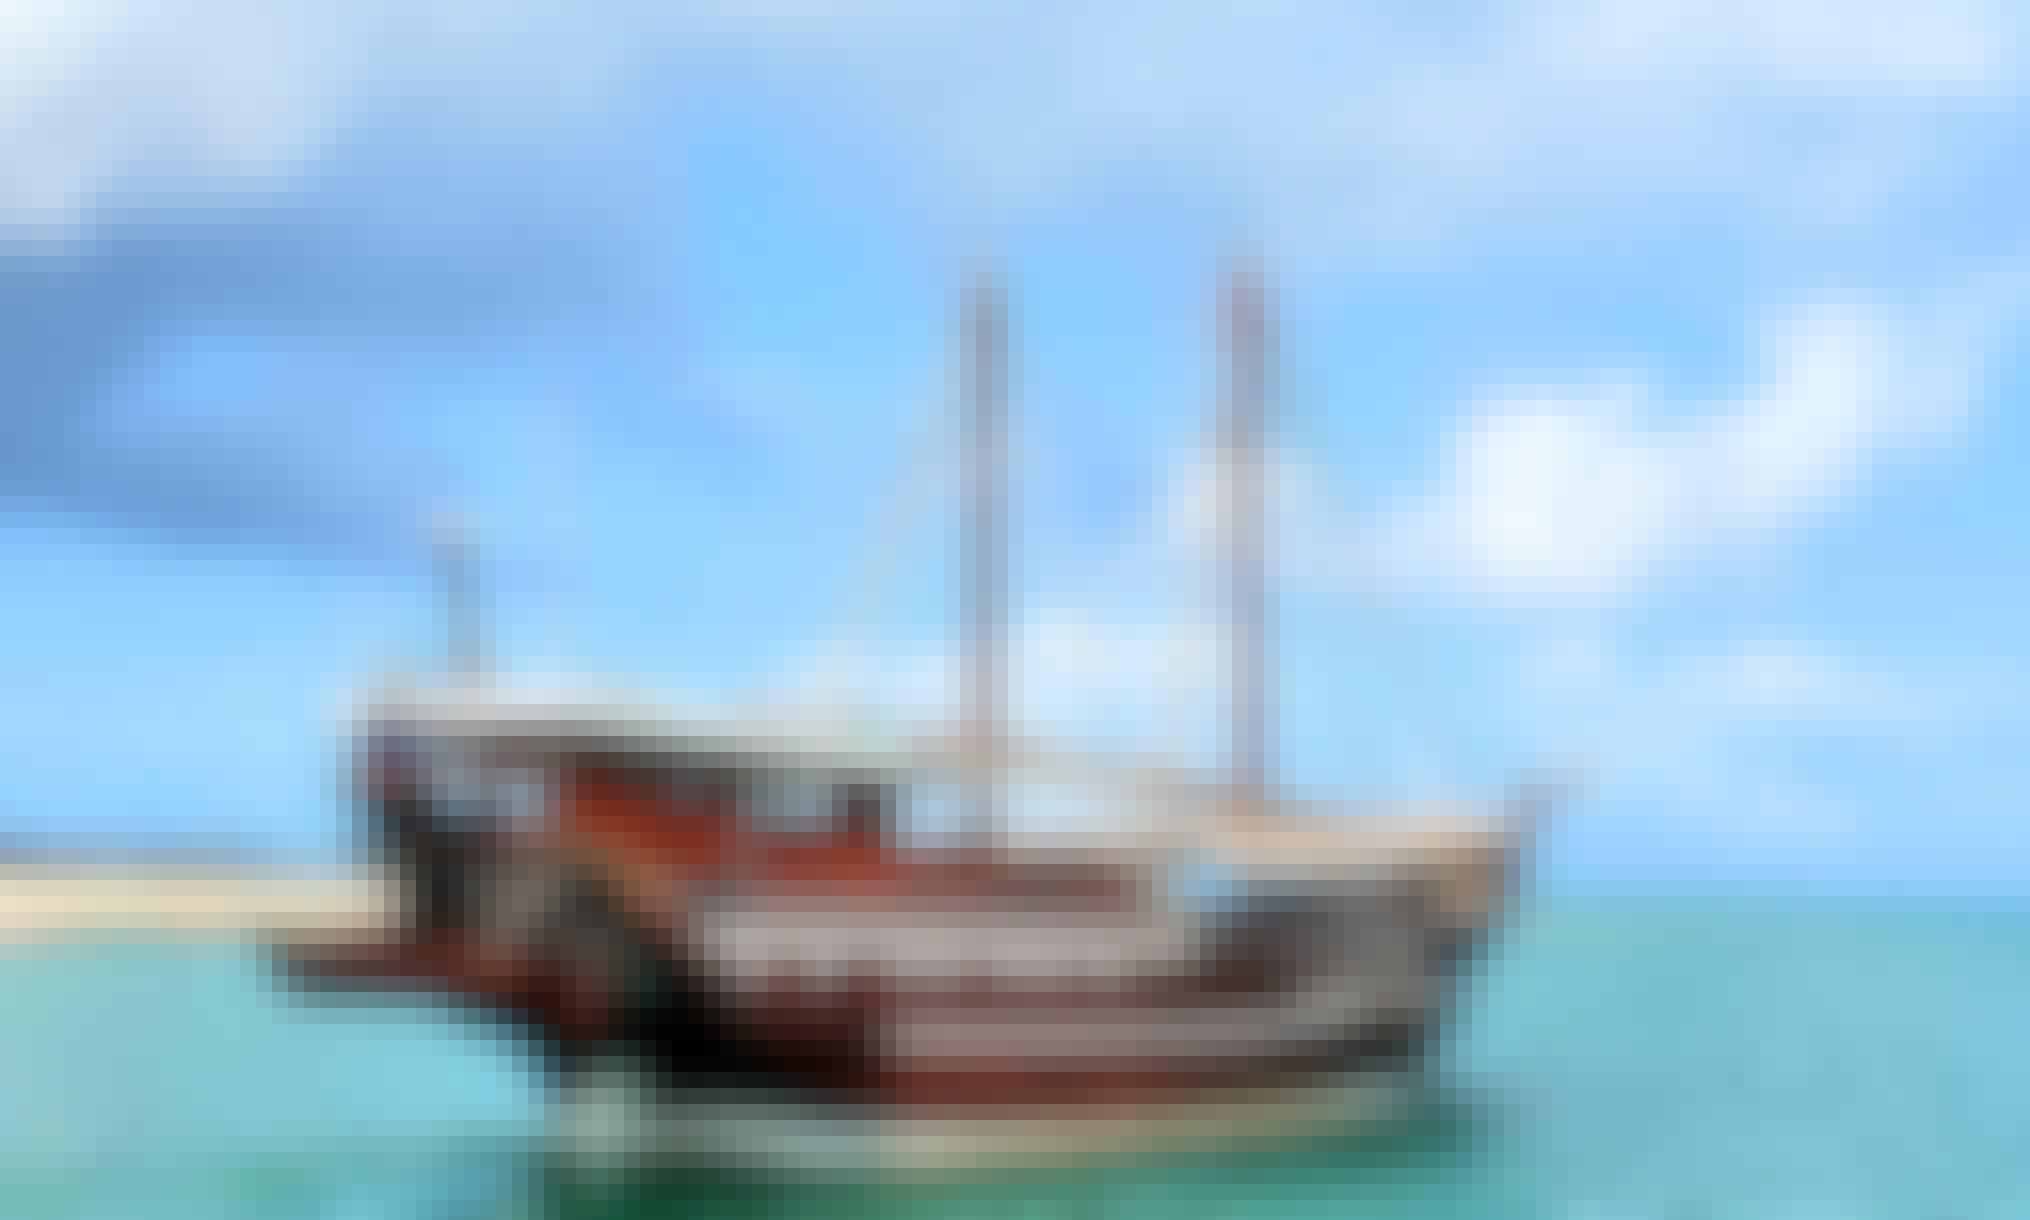 Explore Zanzibar, Tanzania Aboard a Tall Ship for Up to 200 People